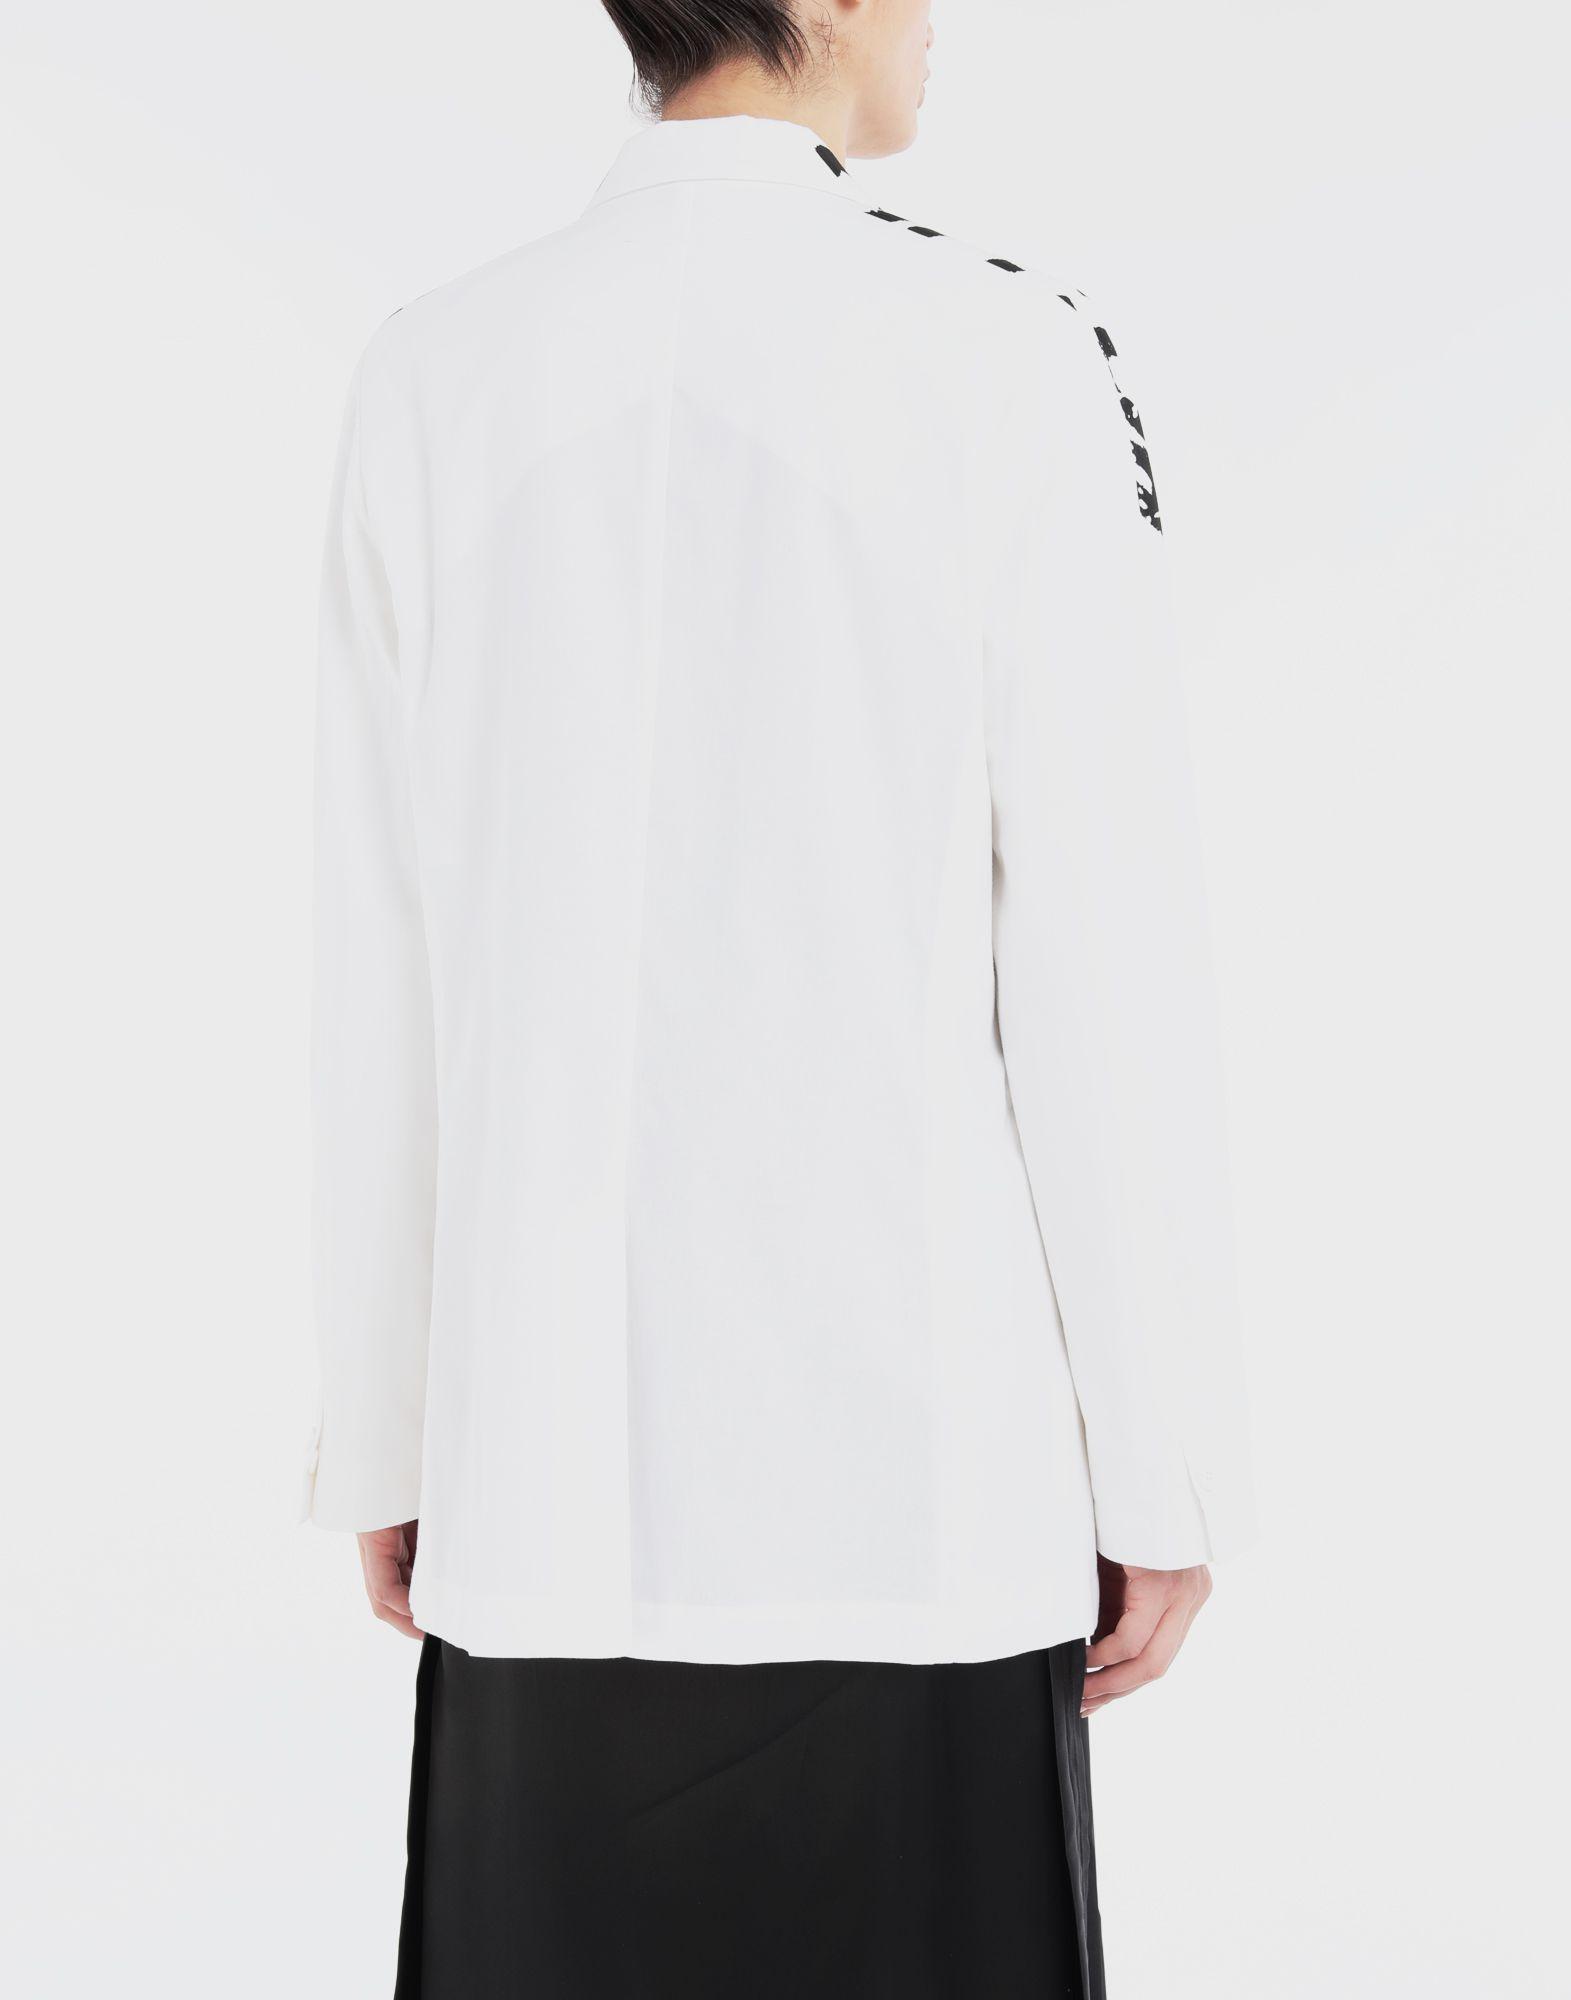 MM6 MAISON MARGIELA Charity AIDS-print cape jacket Jacket Woman e